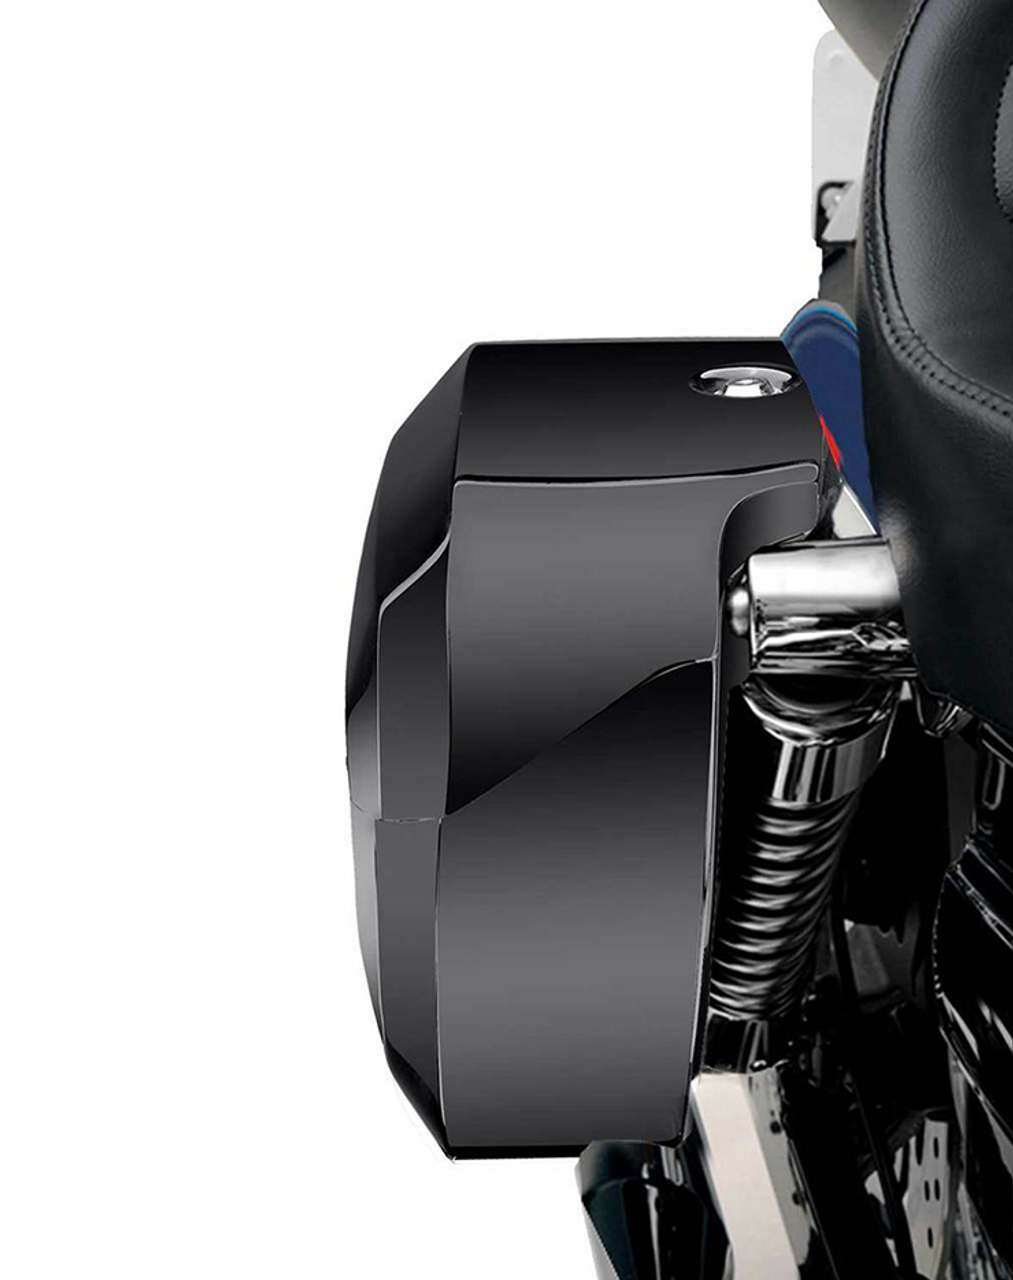 Honda VTX 1300 C Viking Lamellar Large Spear Shock Cutout Hard Saddlebags Shock Cutout View